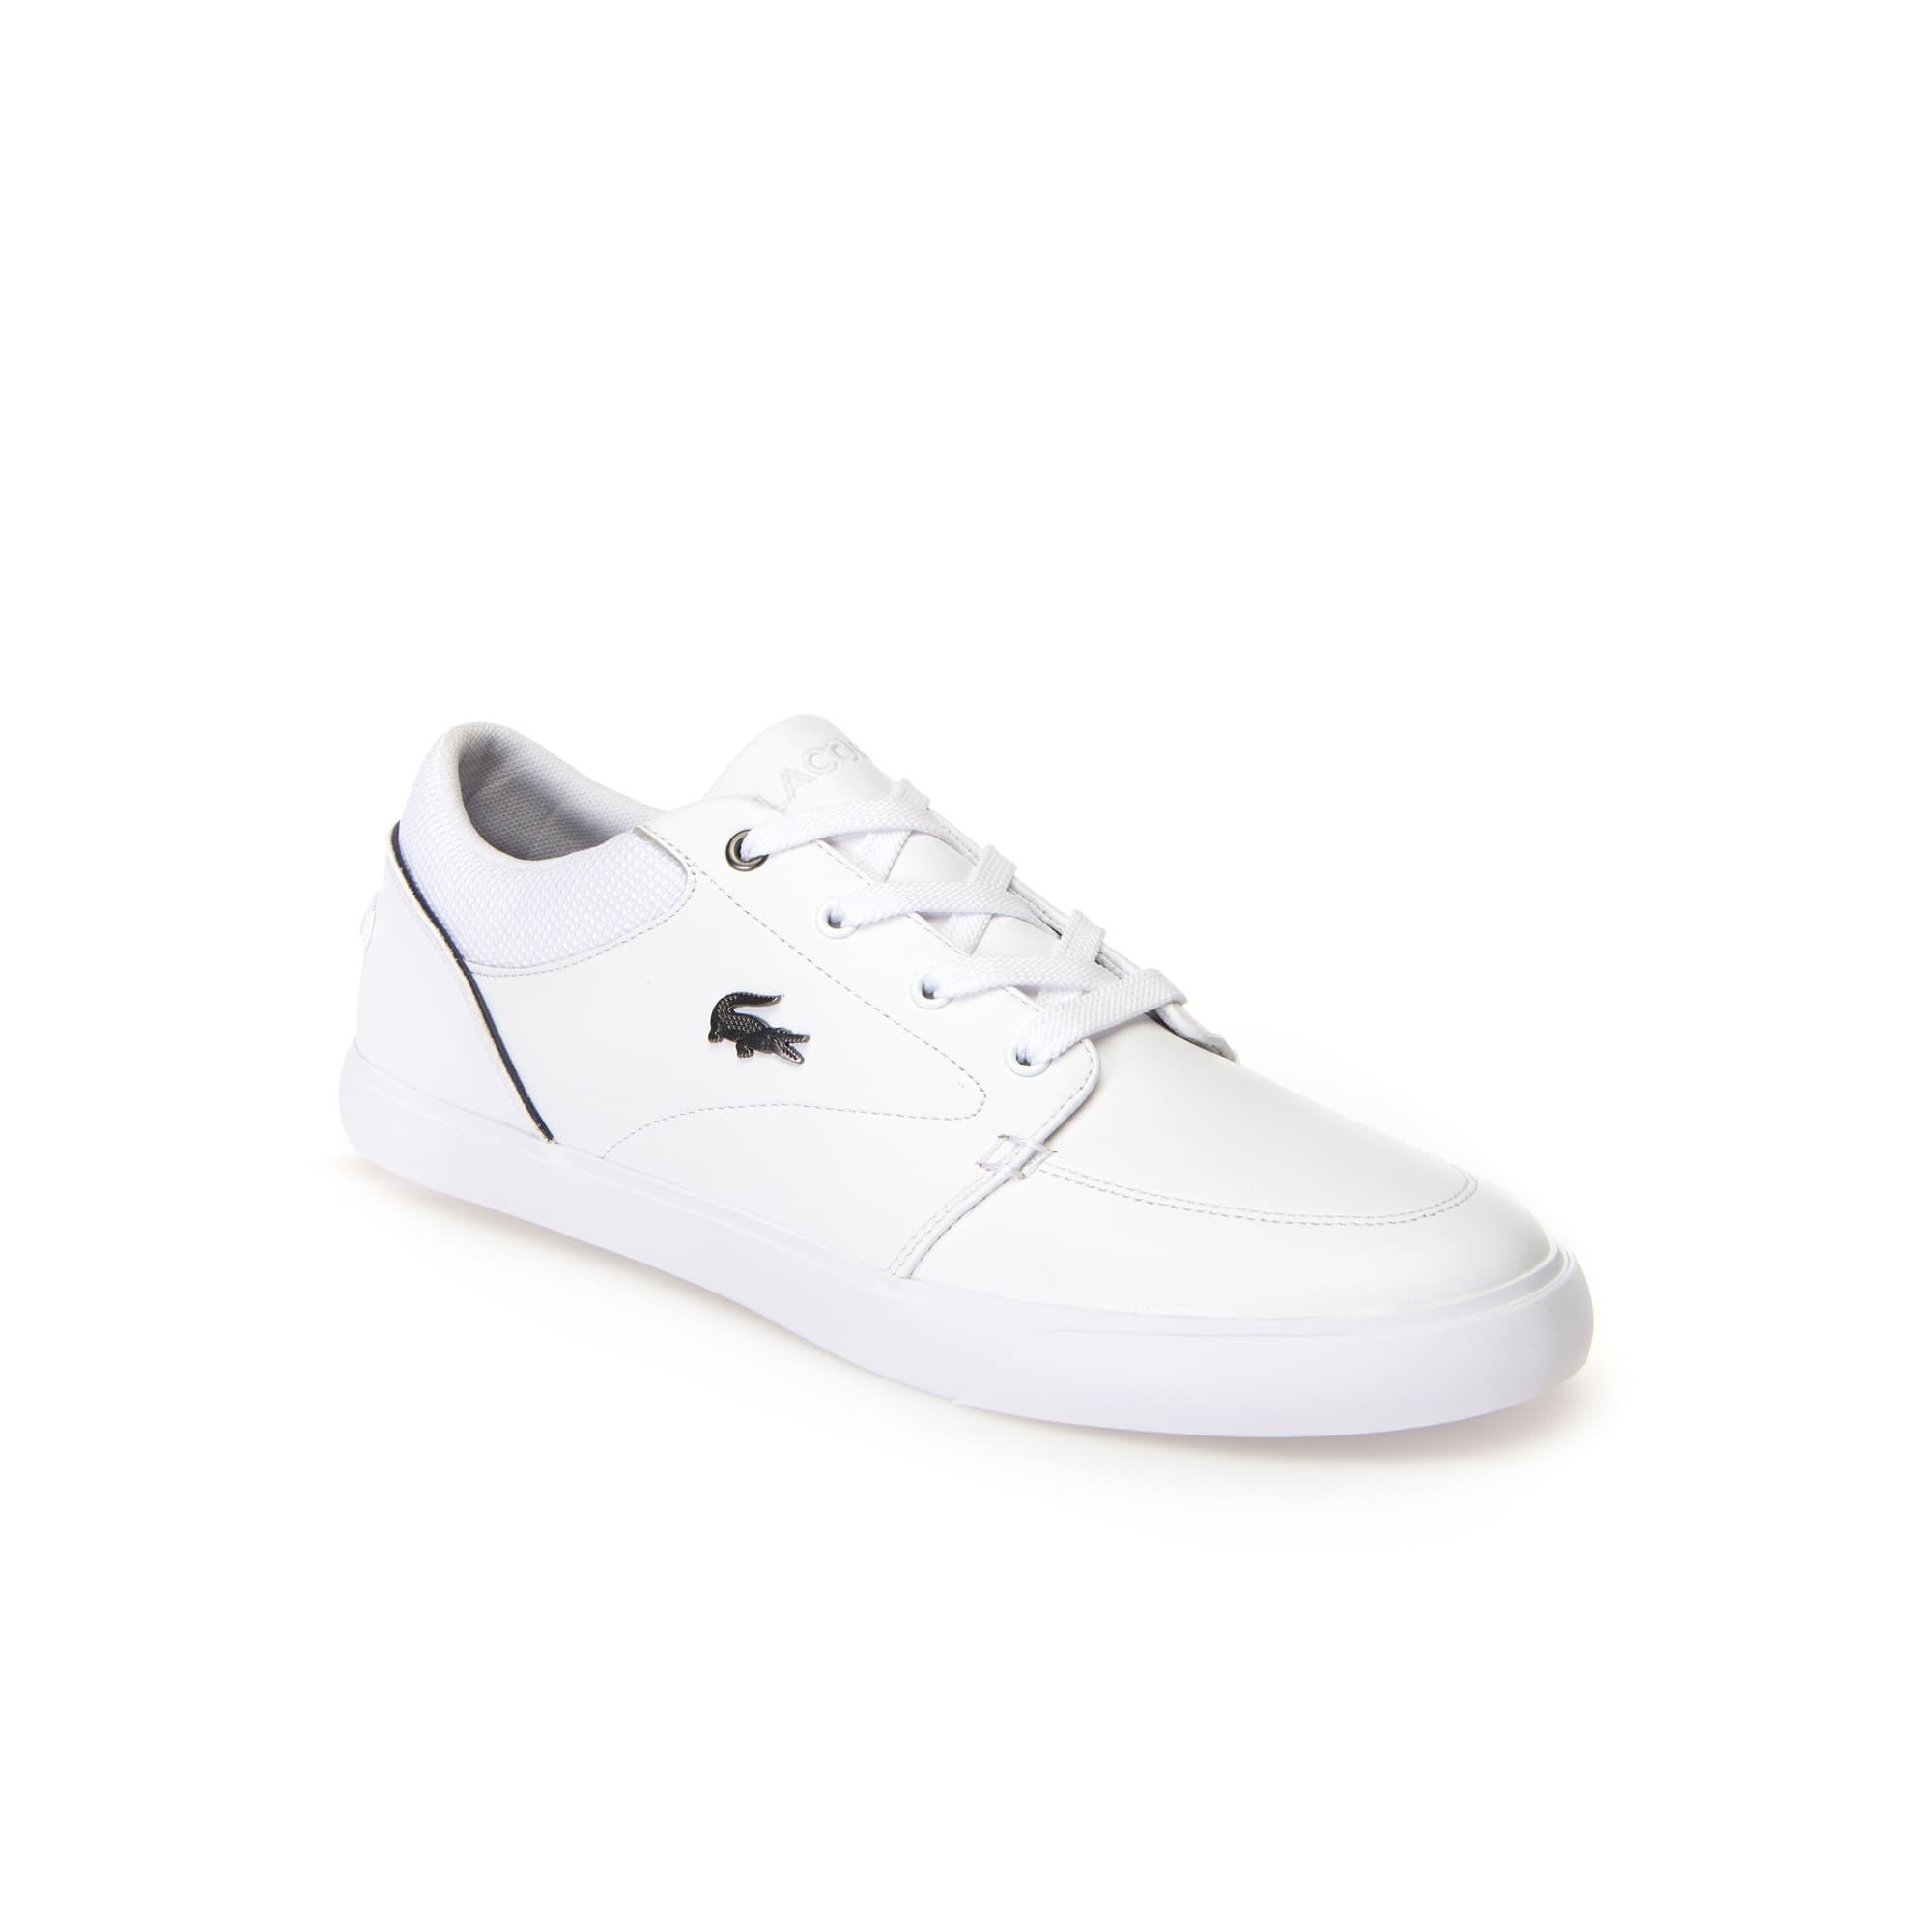 Herren-Sneakers BAYLISS aus Leder